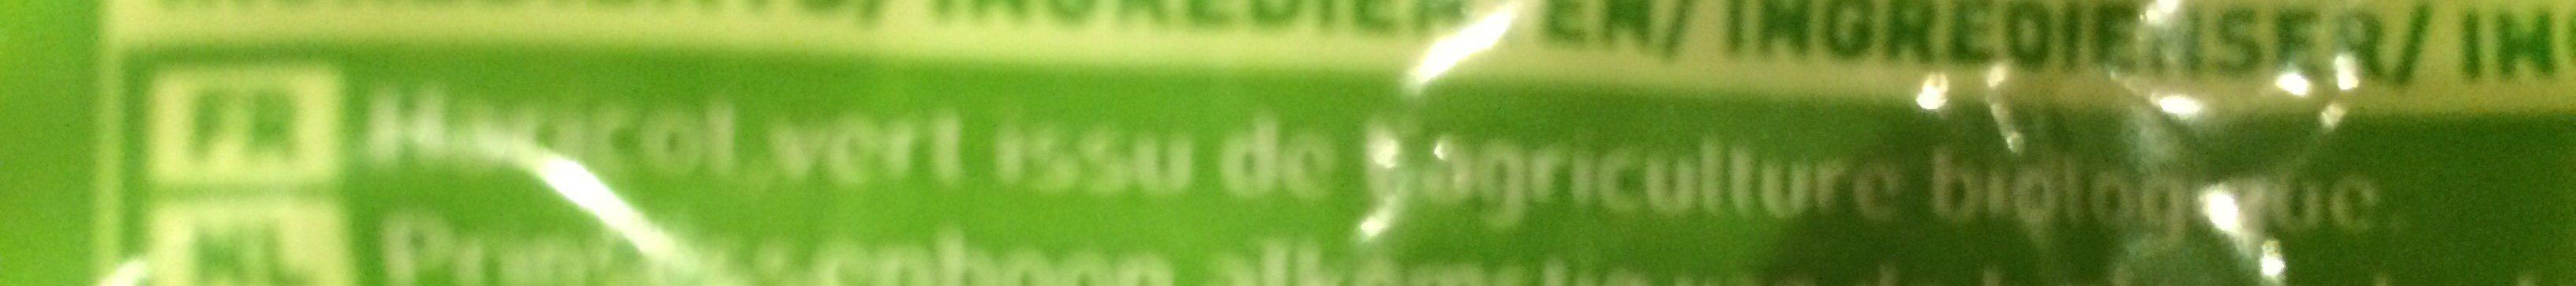 Haricots verts, non calibrés, surgelés - Ingrediënten - fr